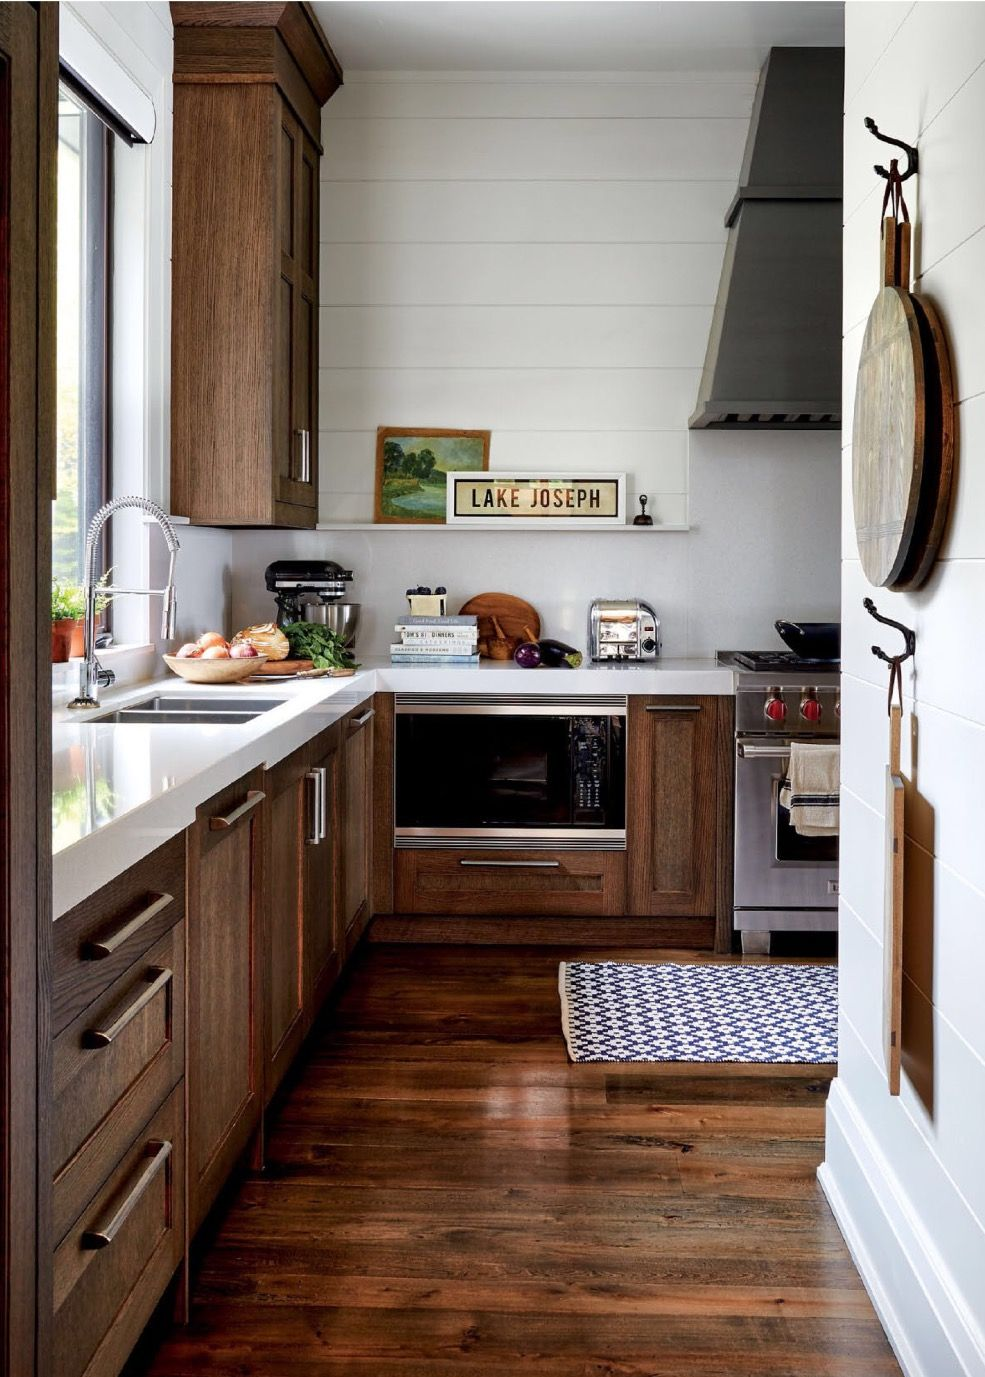 pin by muuz r on مطابخ kitchen renovation kitchen design kitchen cabinets on r kitchen cabinets id=31212